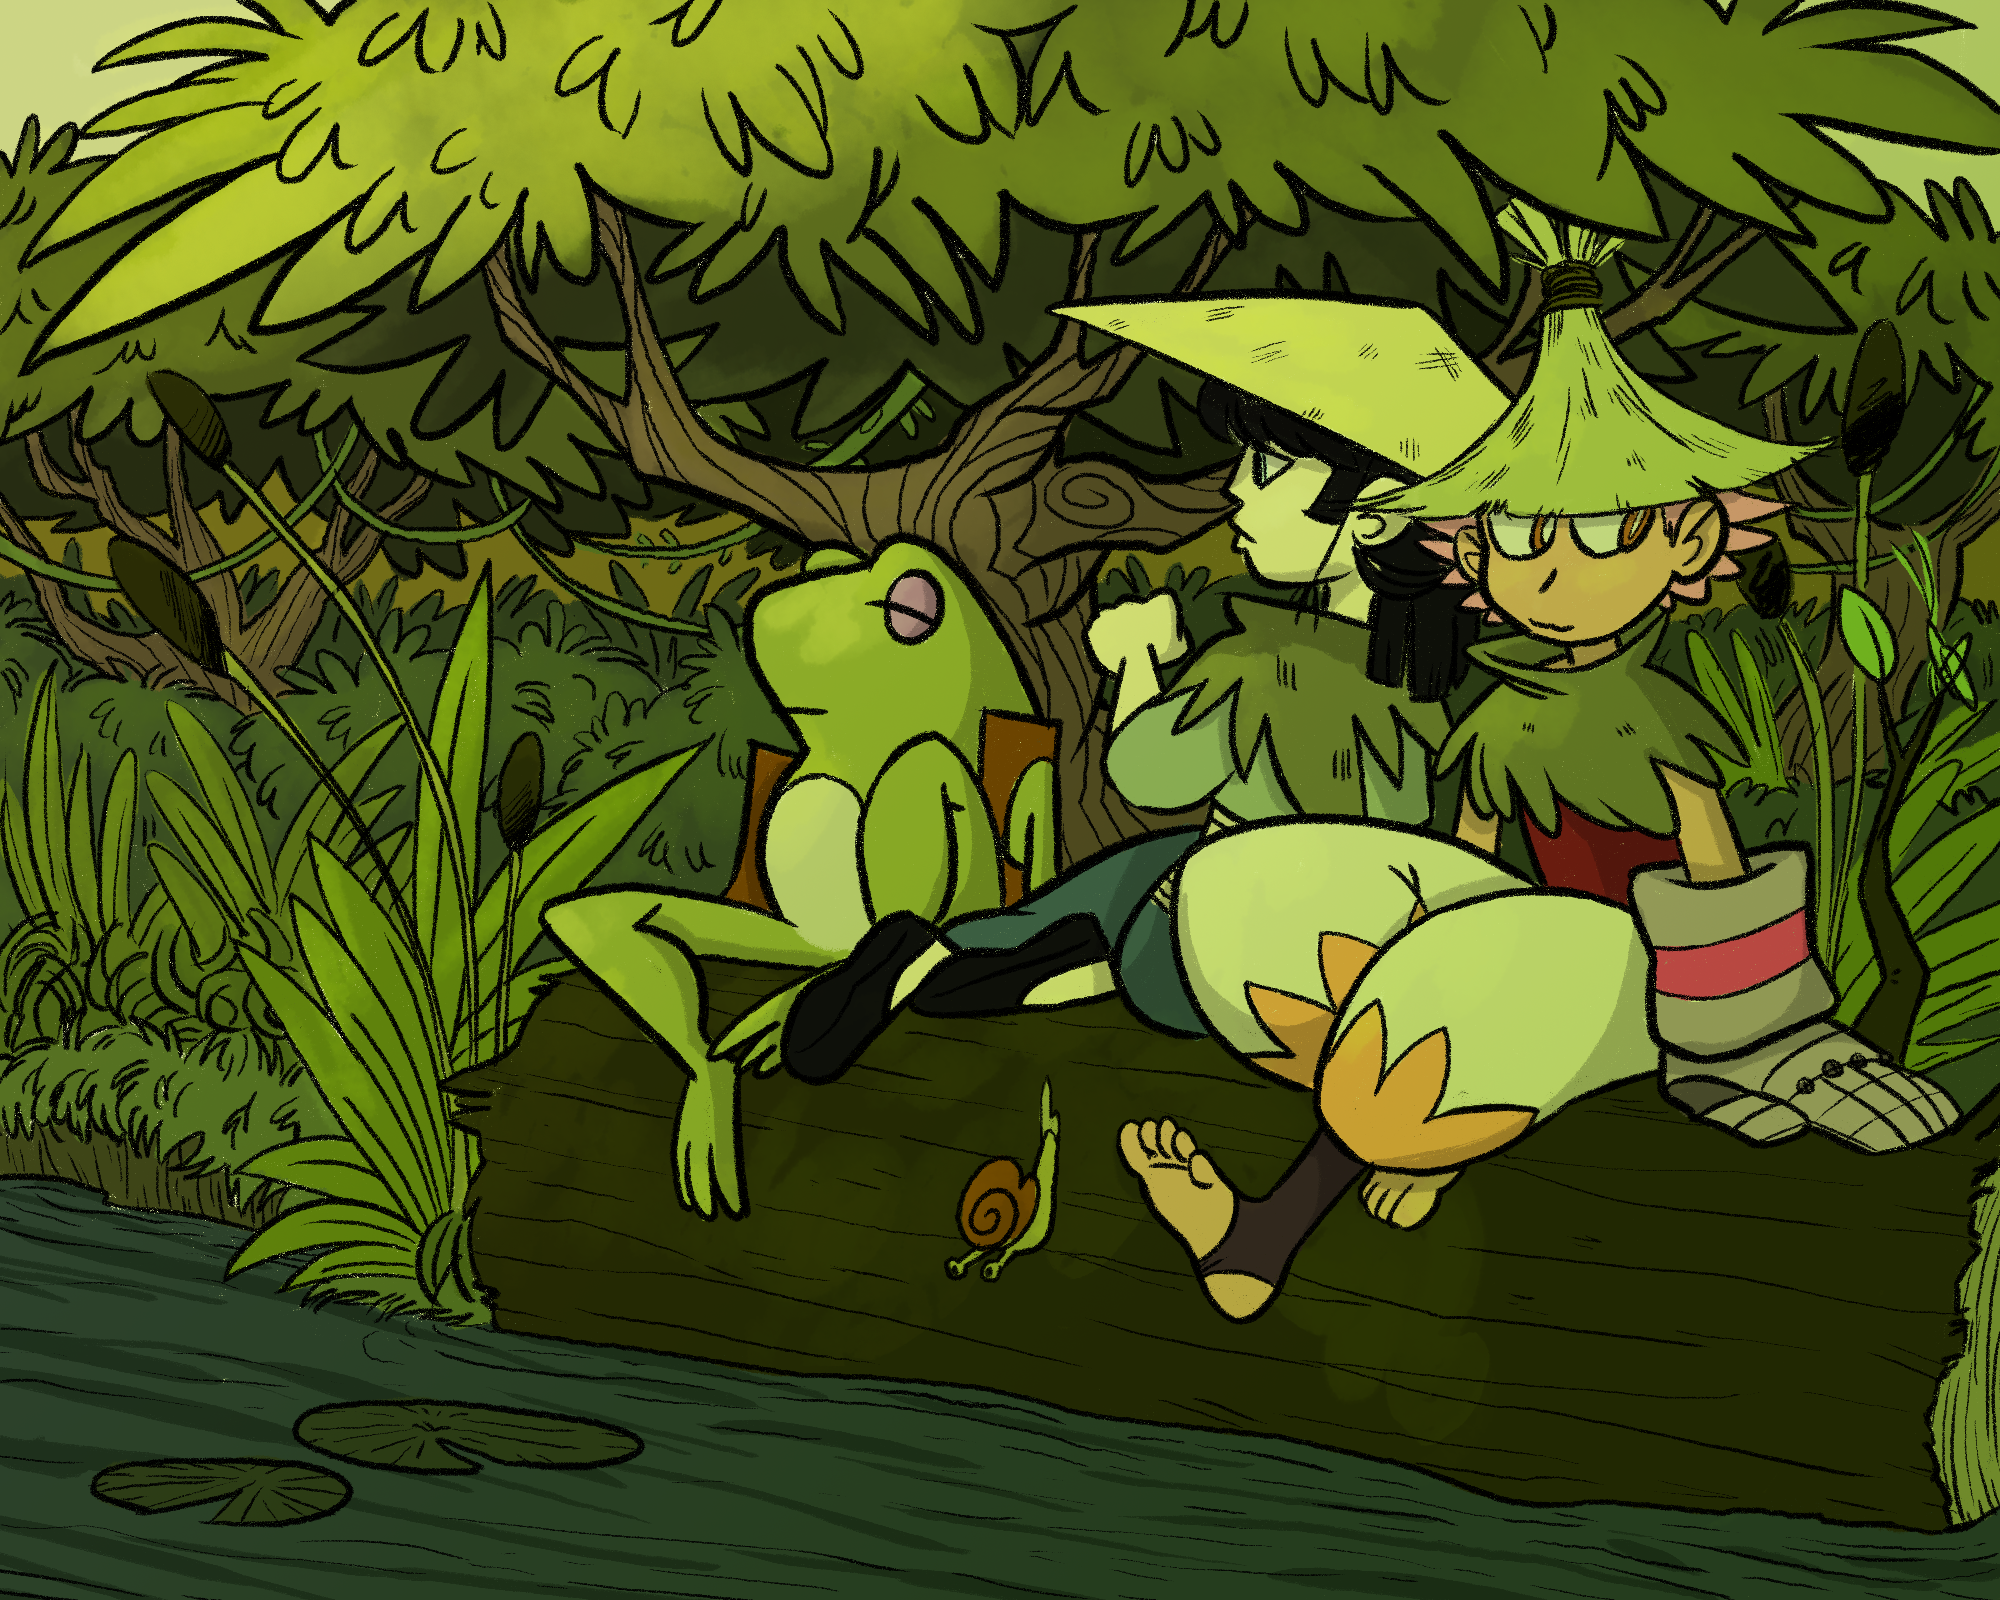 Swamp fashion